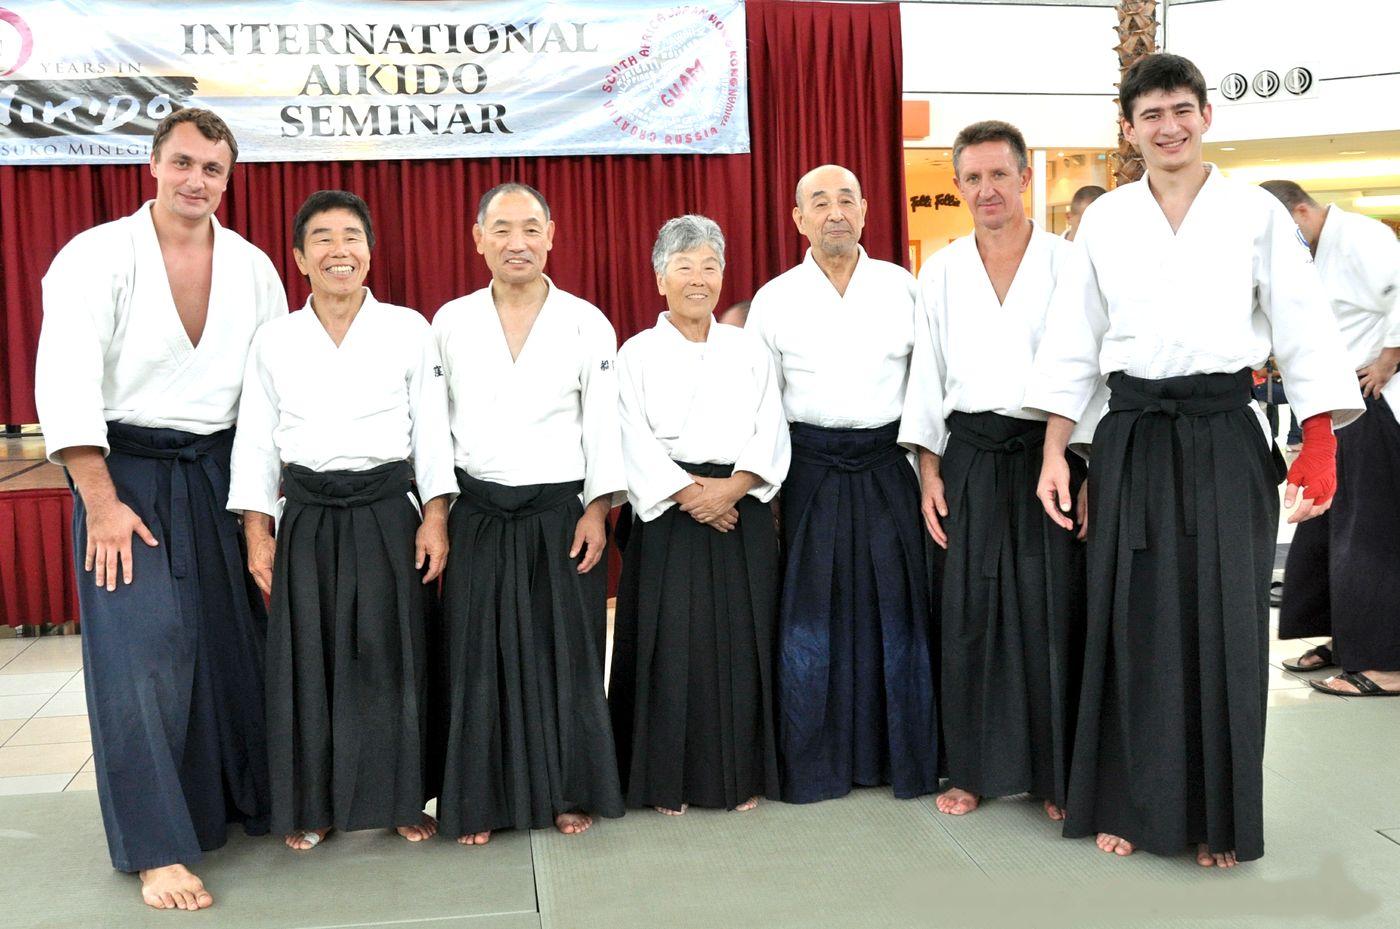 Международный семинар по айкидо